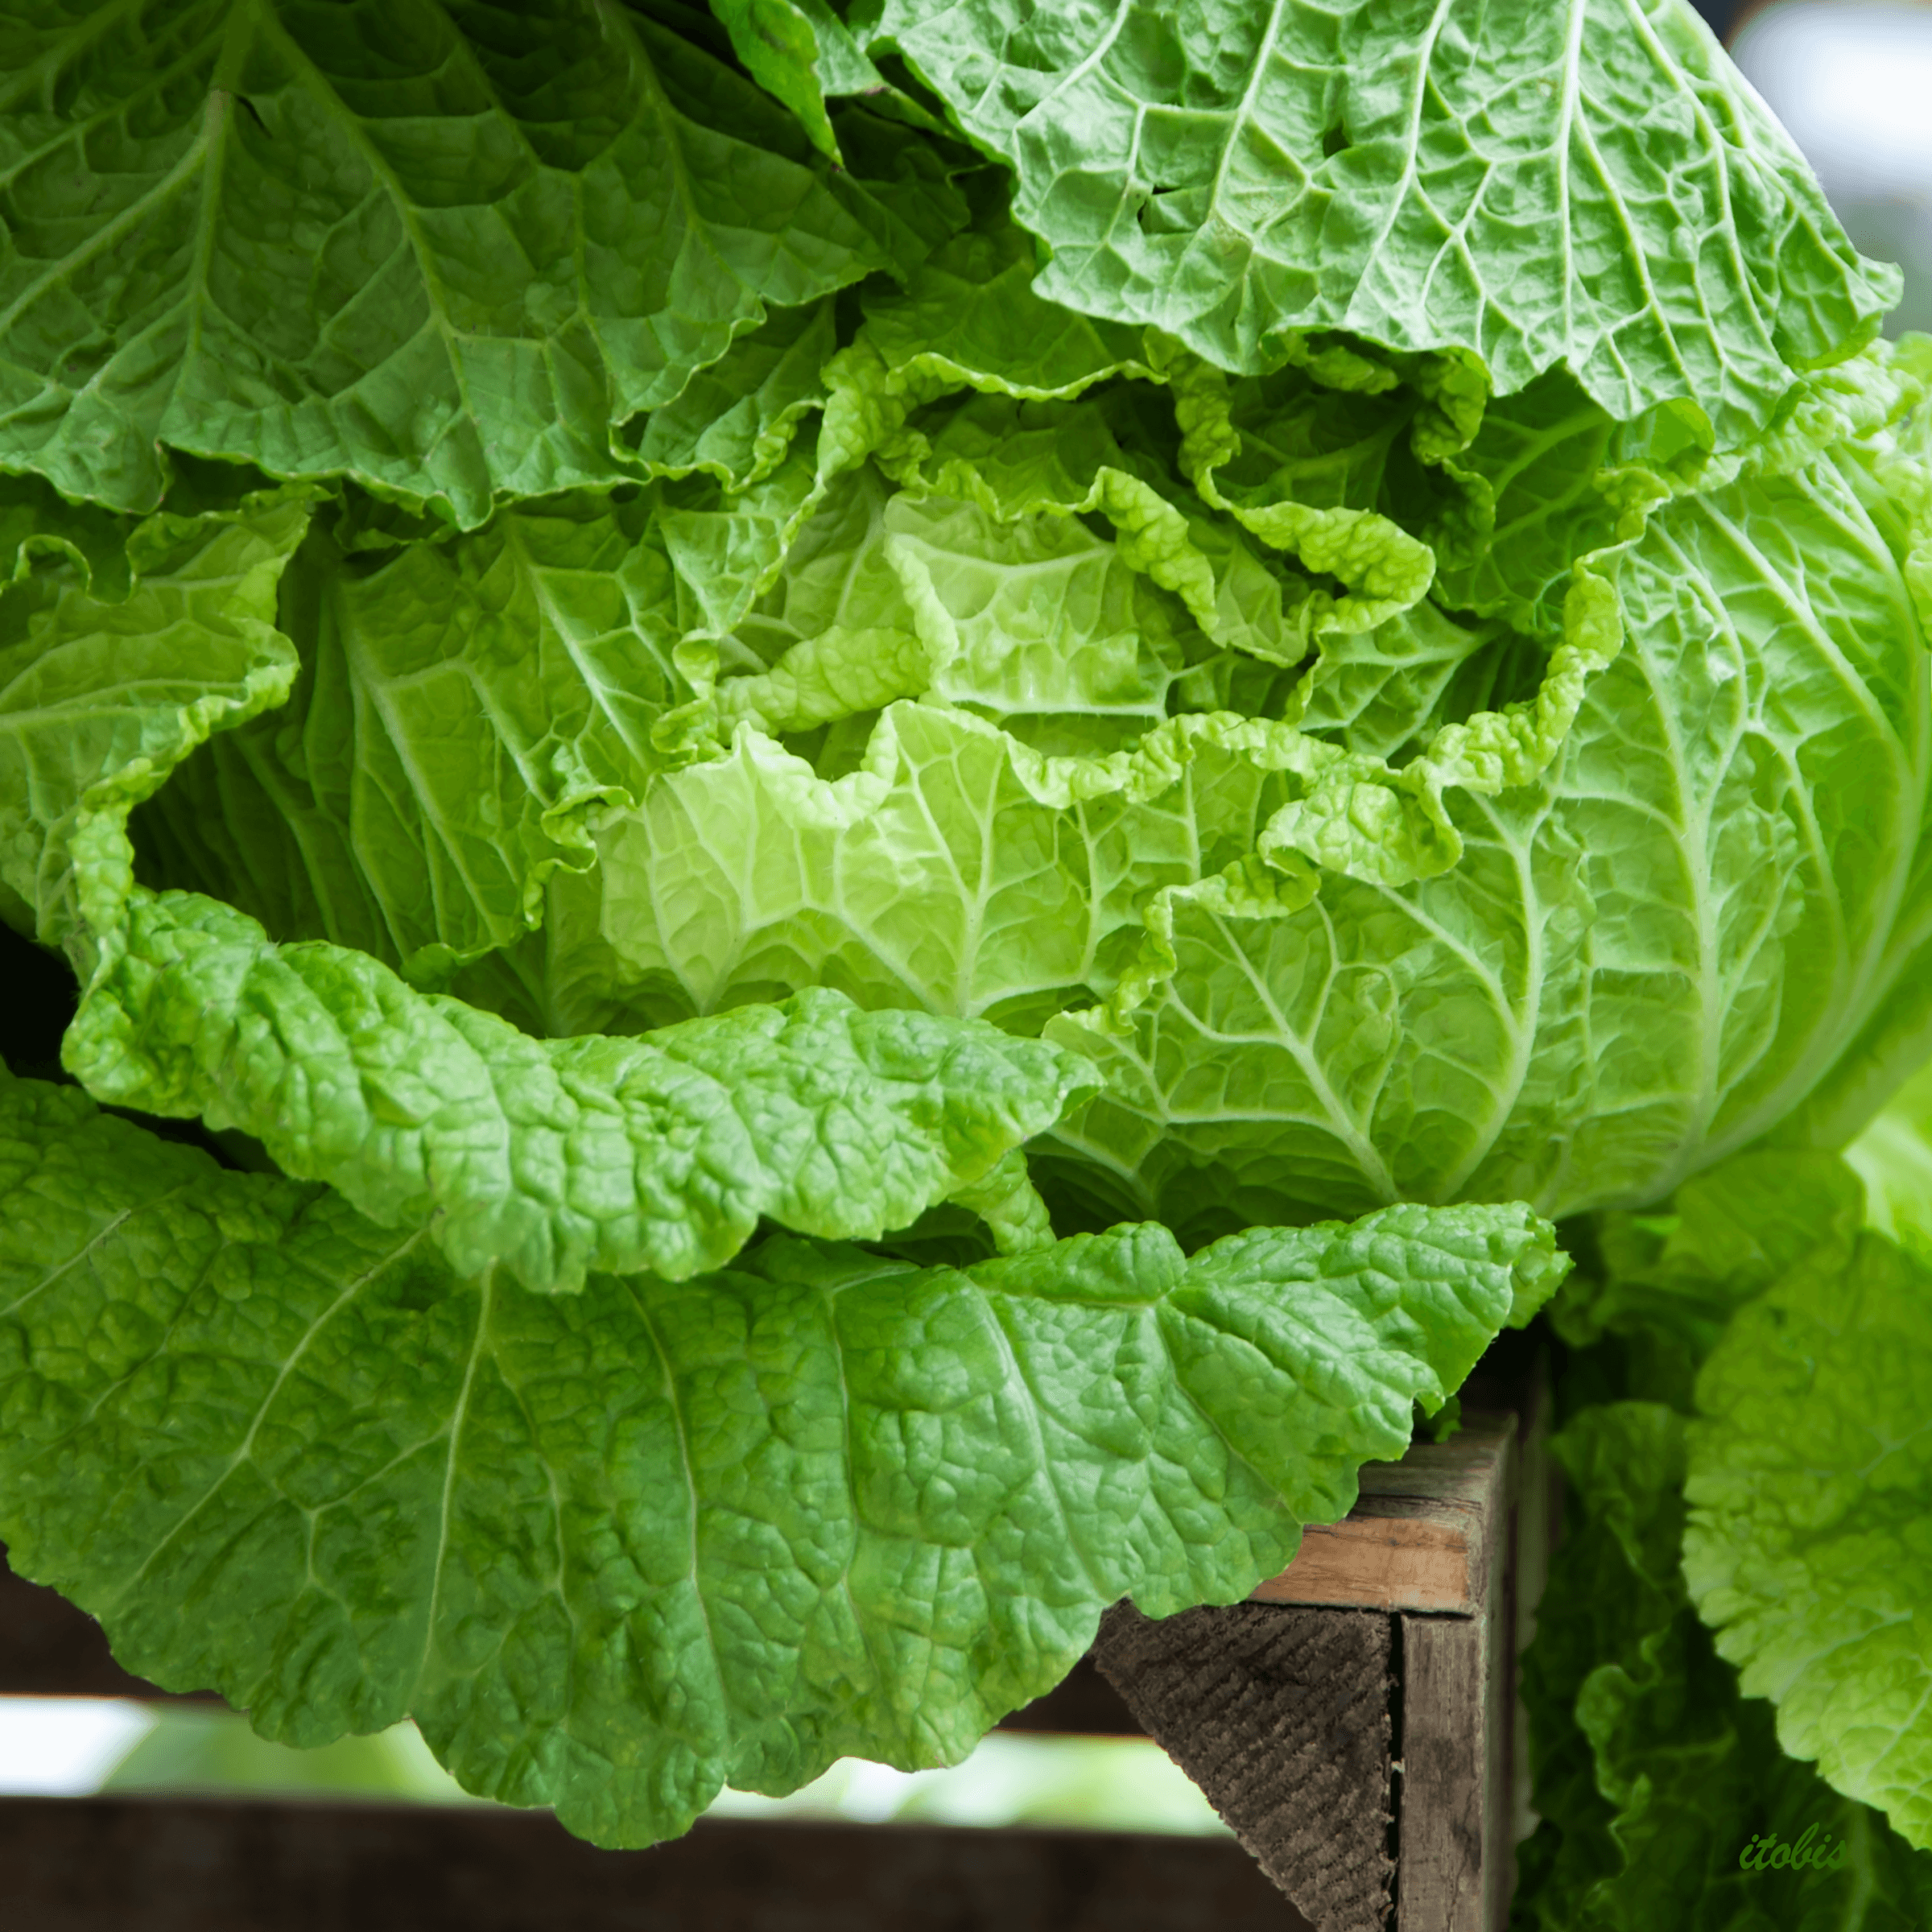 Cabbage at the Market - Roots Down Organic Farm - Ottawa Farmers' Market, Lansdowne Park, Ottawa, Ontario - photo by Irene Tobis